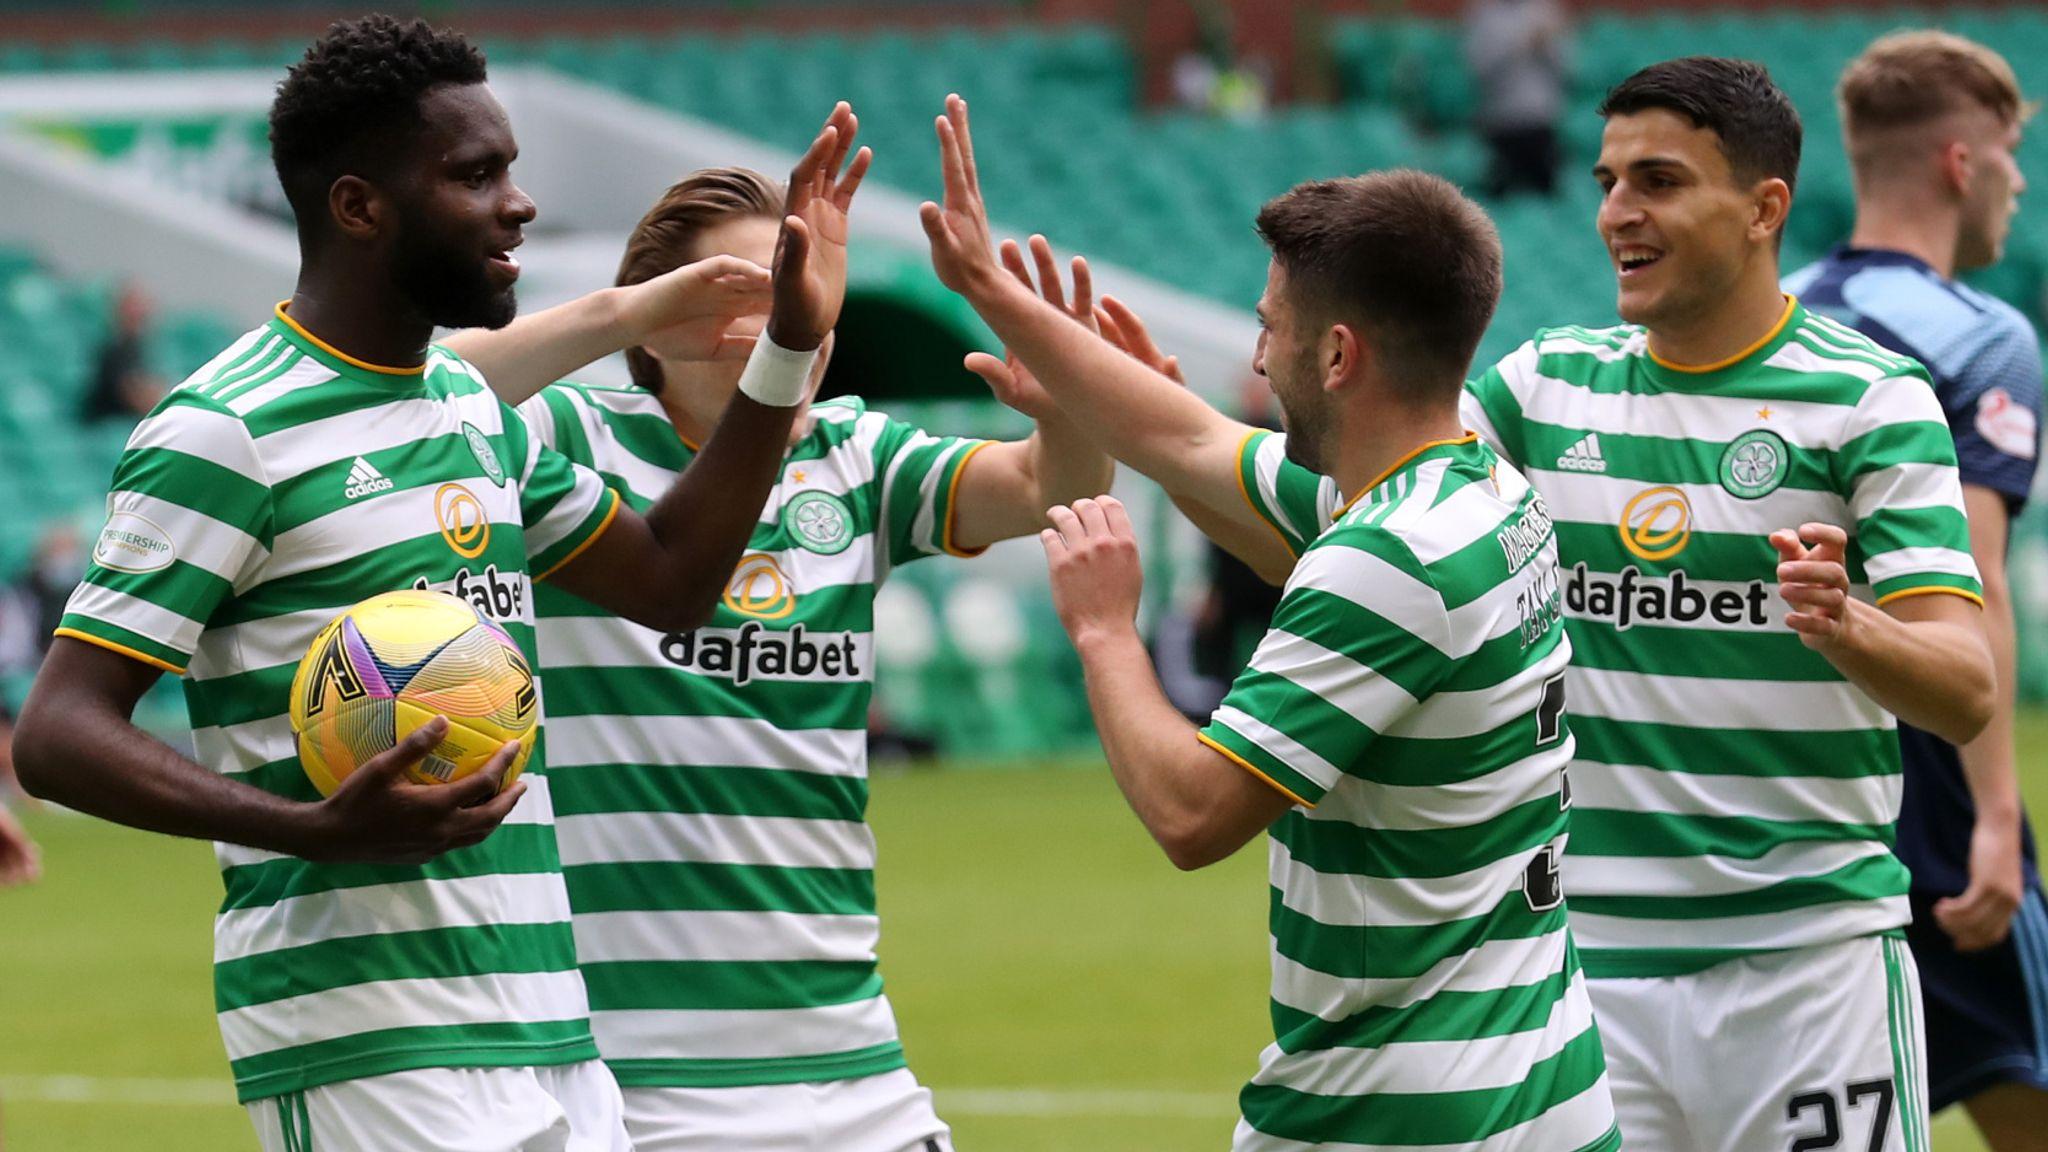 Live match preview - Celtic vs Ferencvaros 26.08.2020